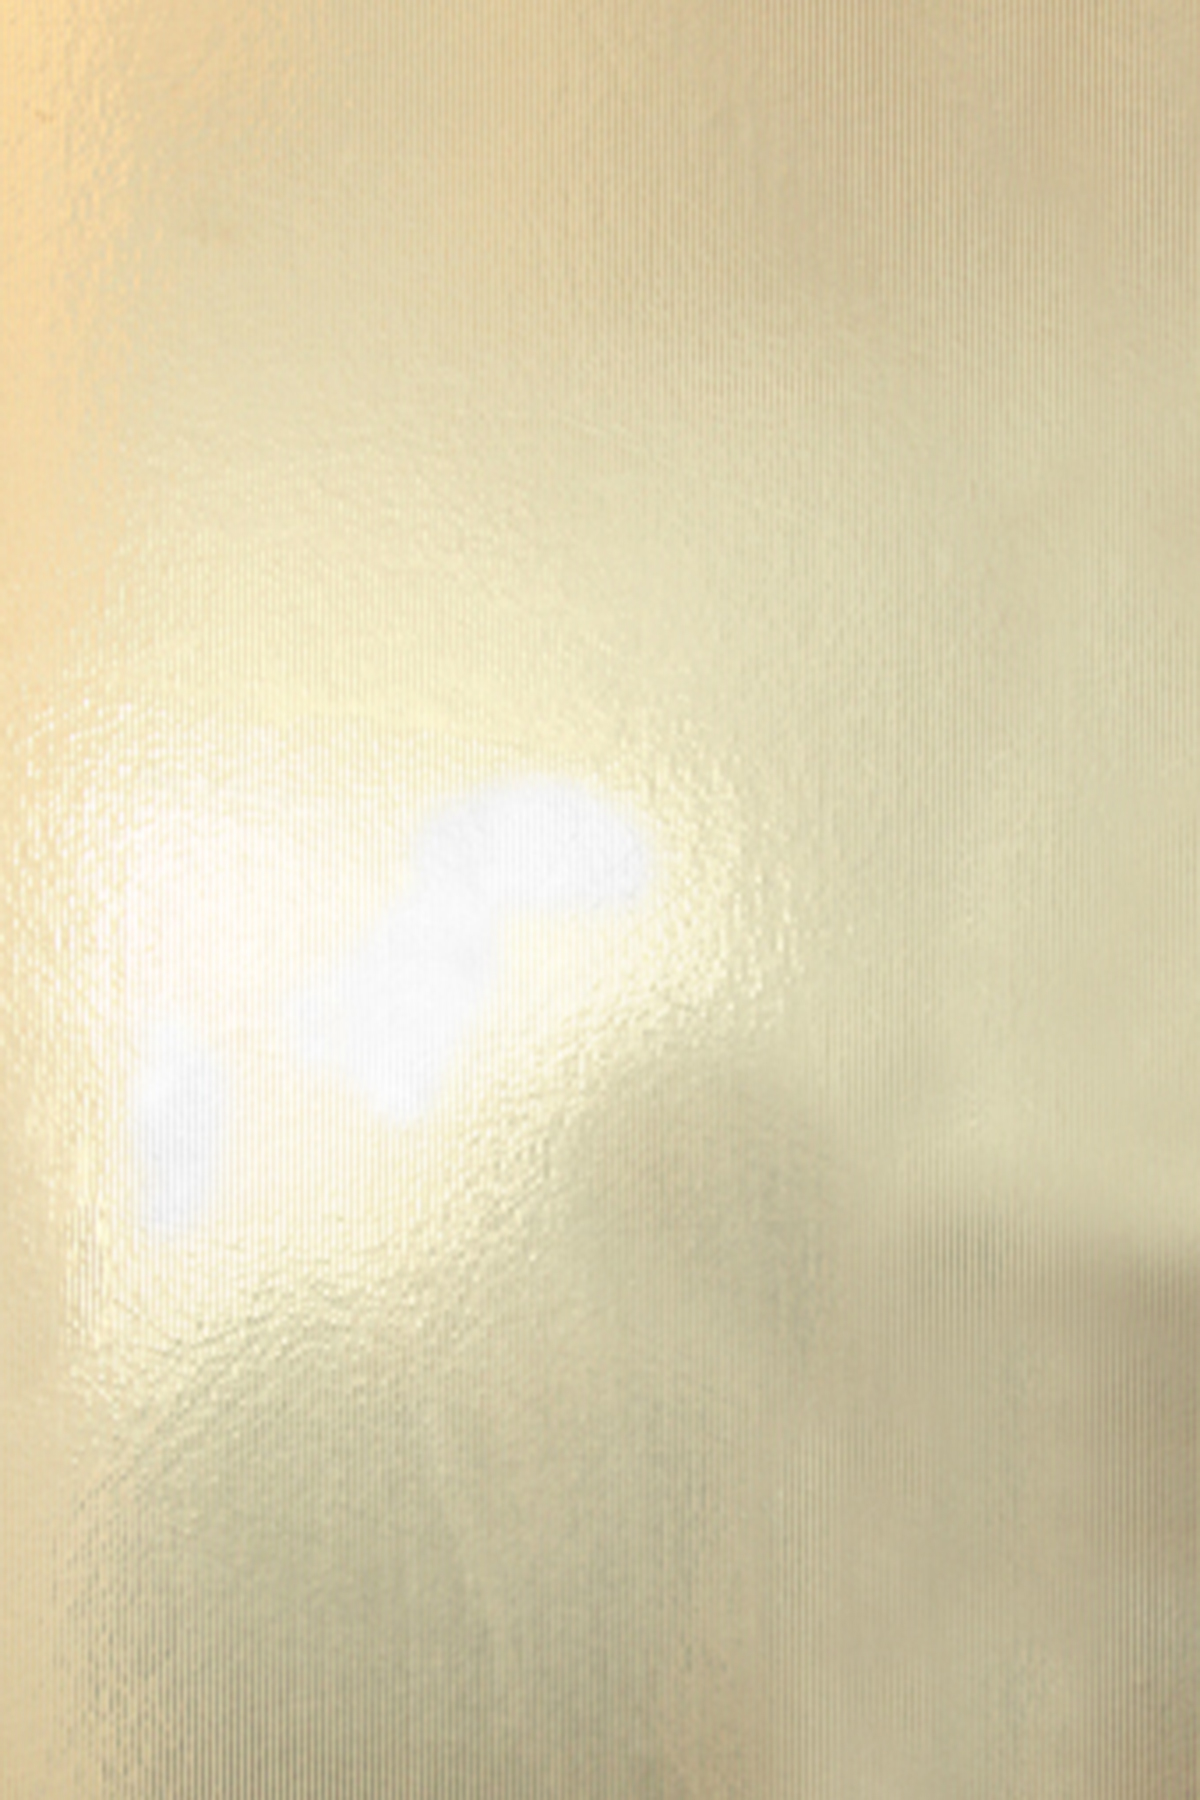 Microstripe Wallpaper   Cream and Gold Monument Interiors 1200x1800